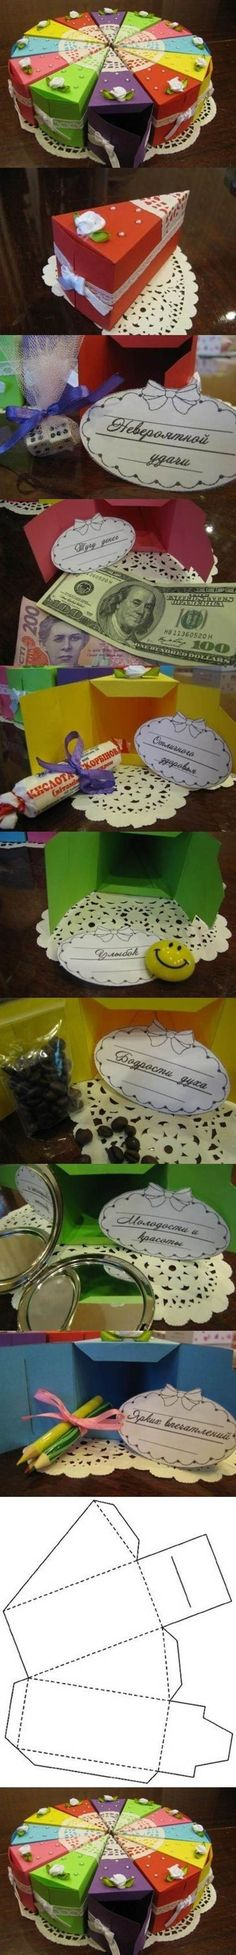 DIY Cake Shaped Gift Boxes | iCreativeIdeas.com Follow Us on Facebook --> https://www.facebook.com/iCreativeIdeas